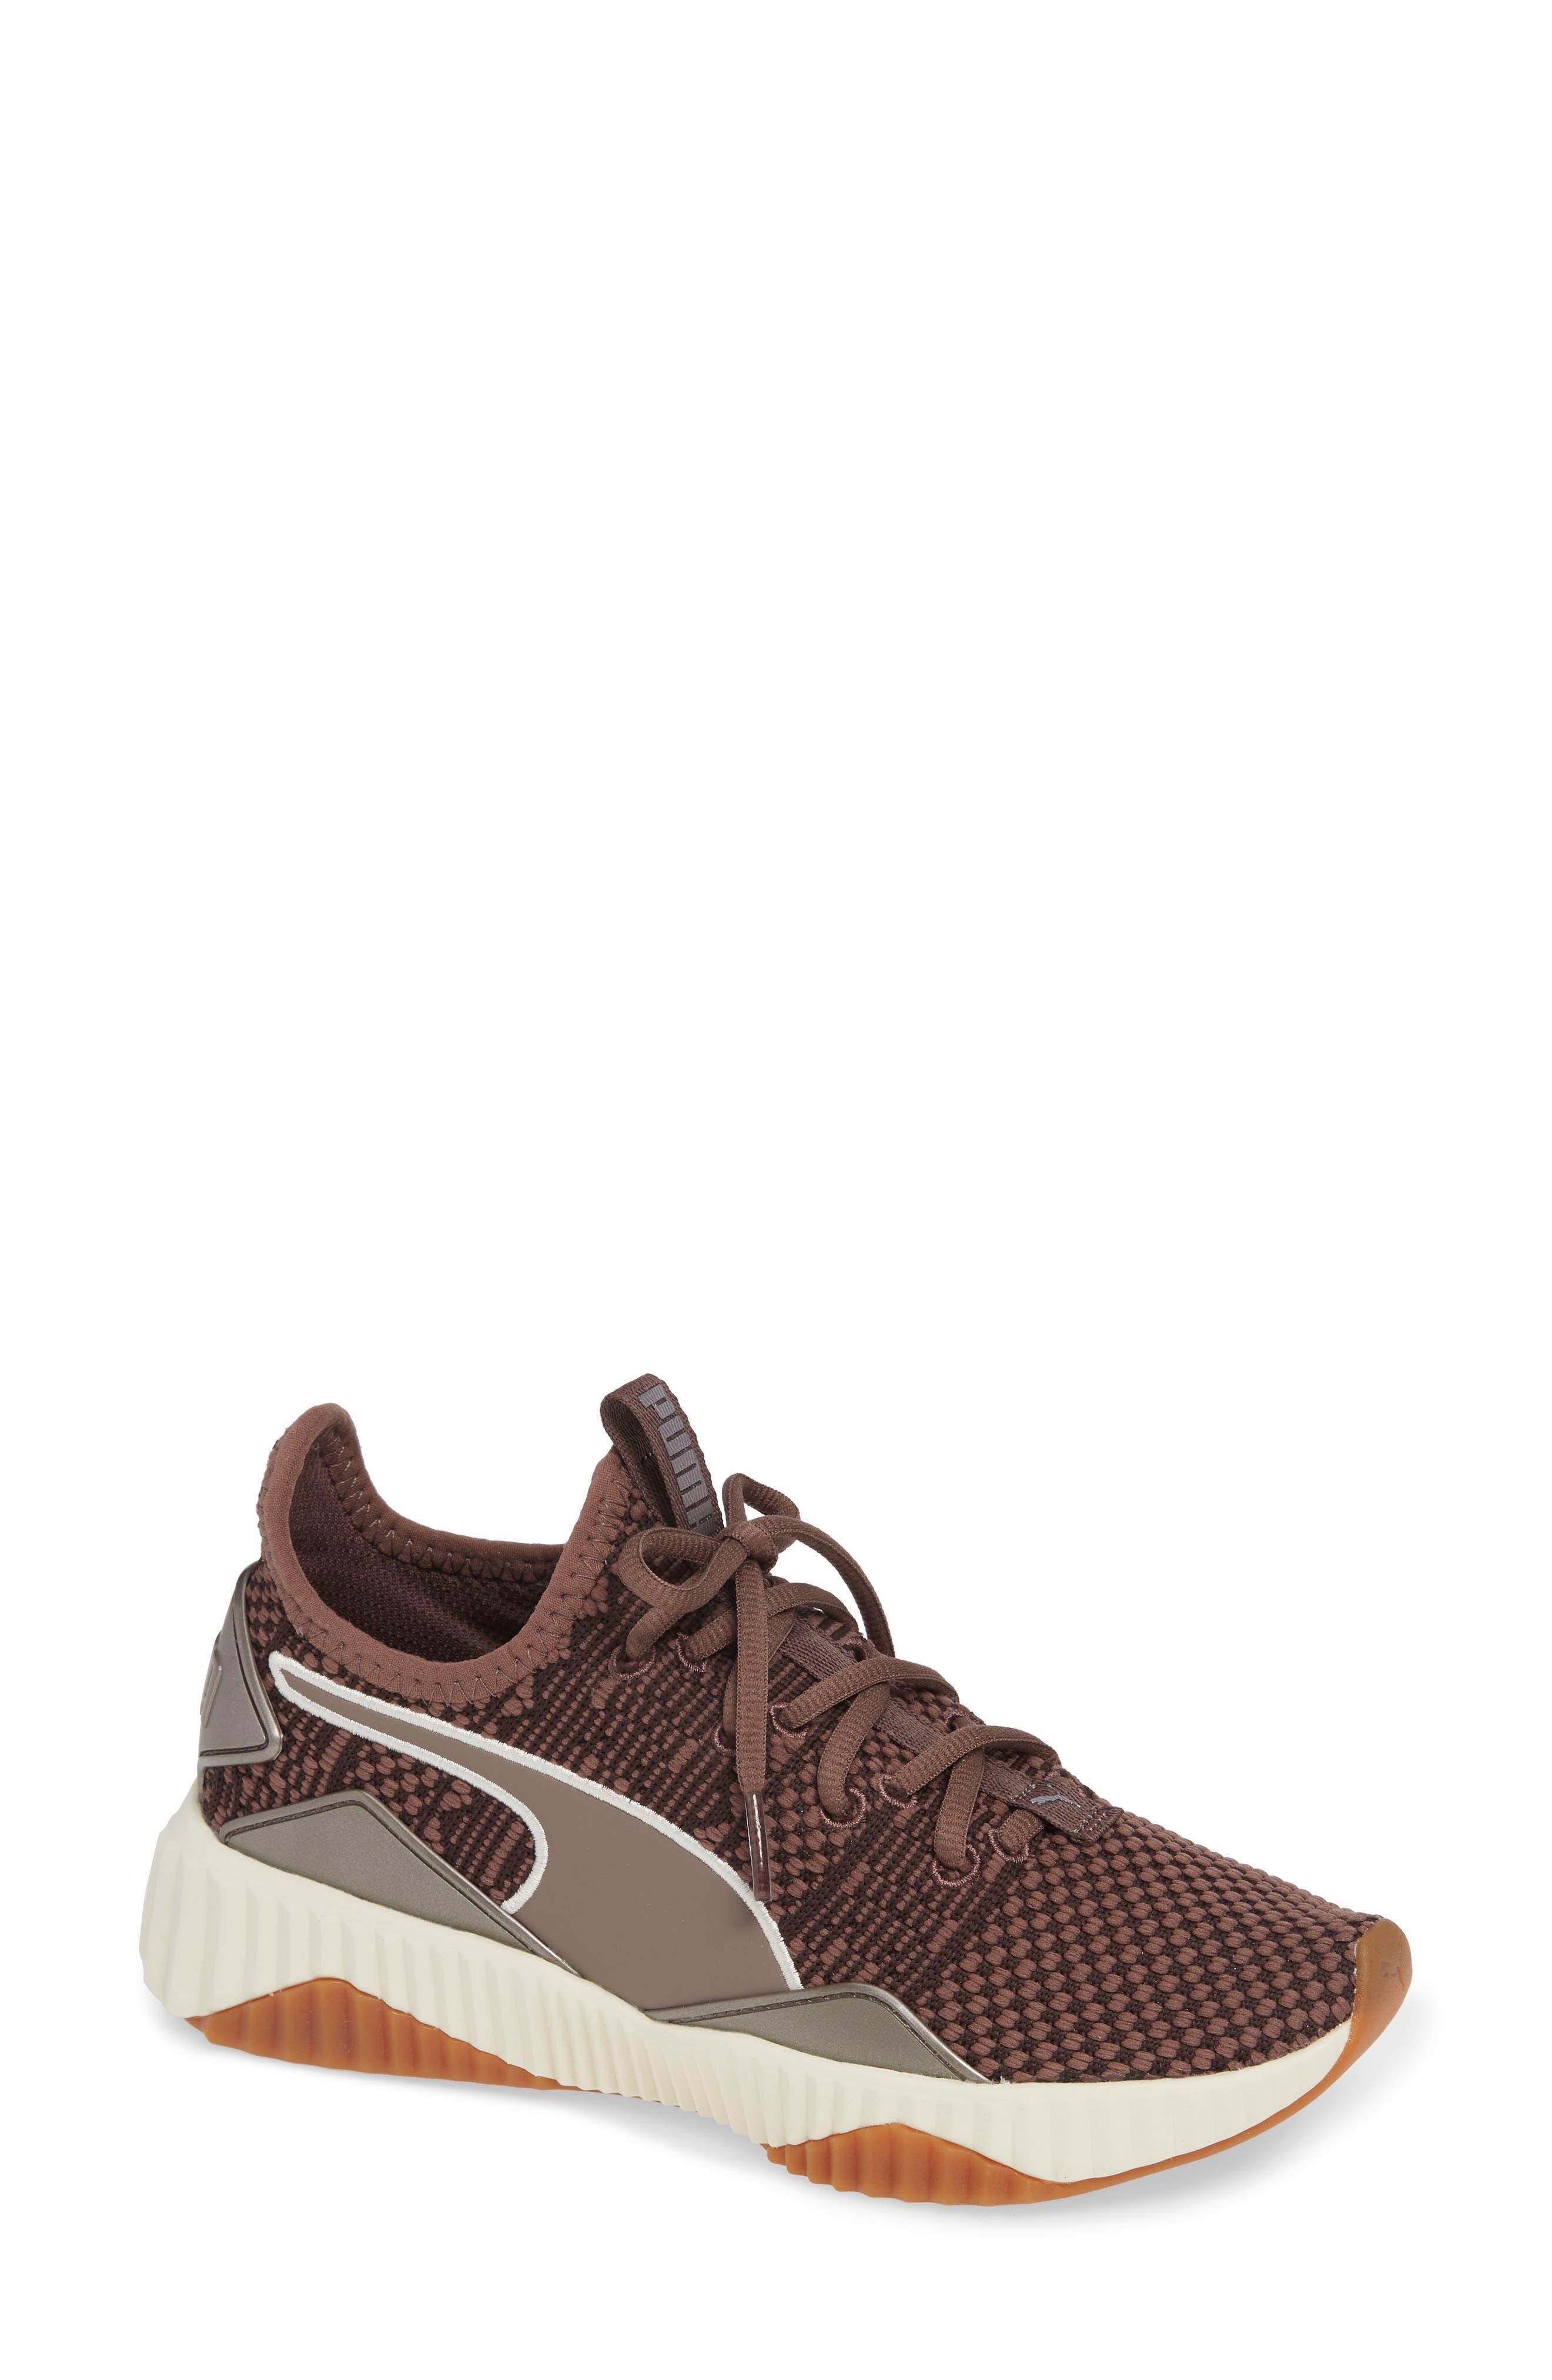 PUMA Defy Luxe Sneaker, Main, color, PEPPERCORN/ METALLIC ASH